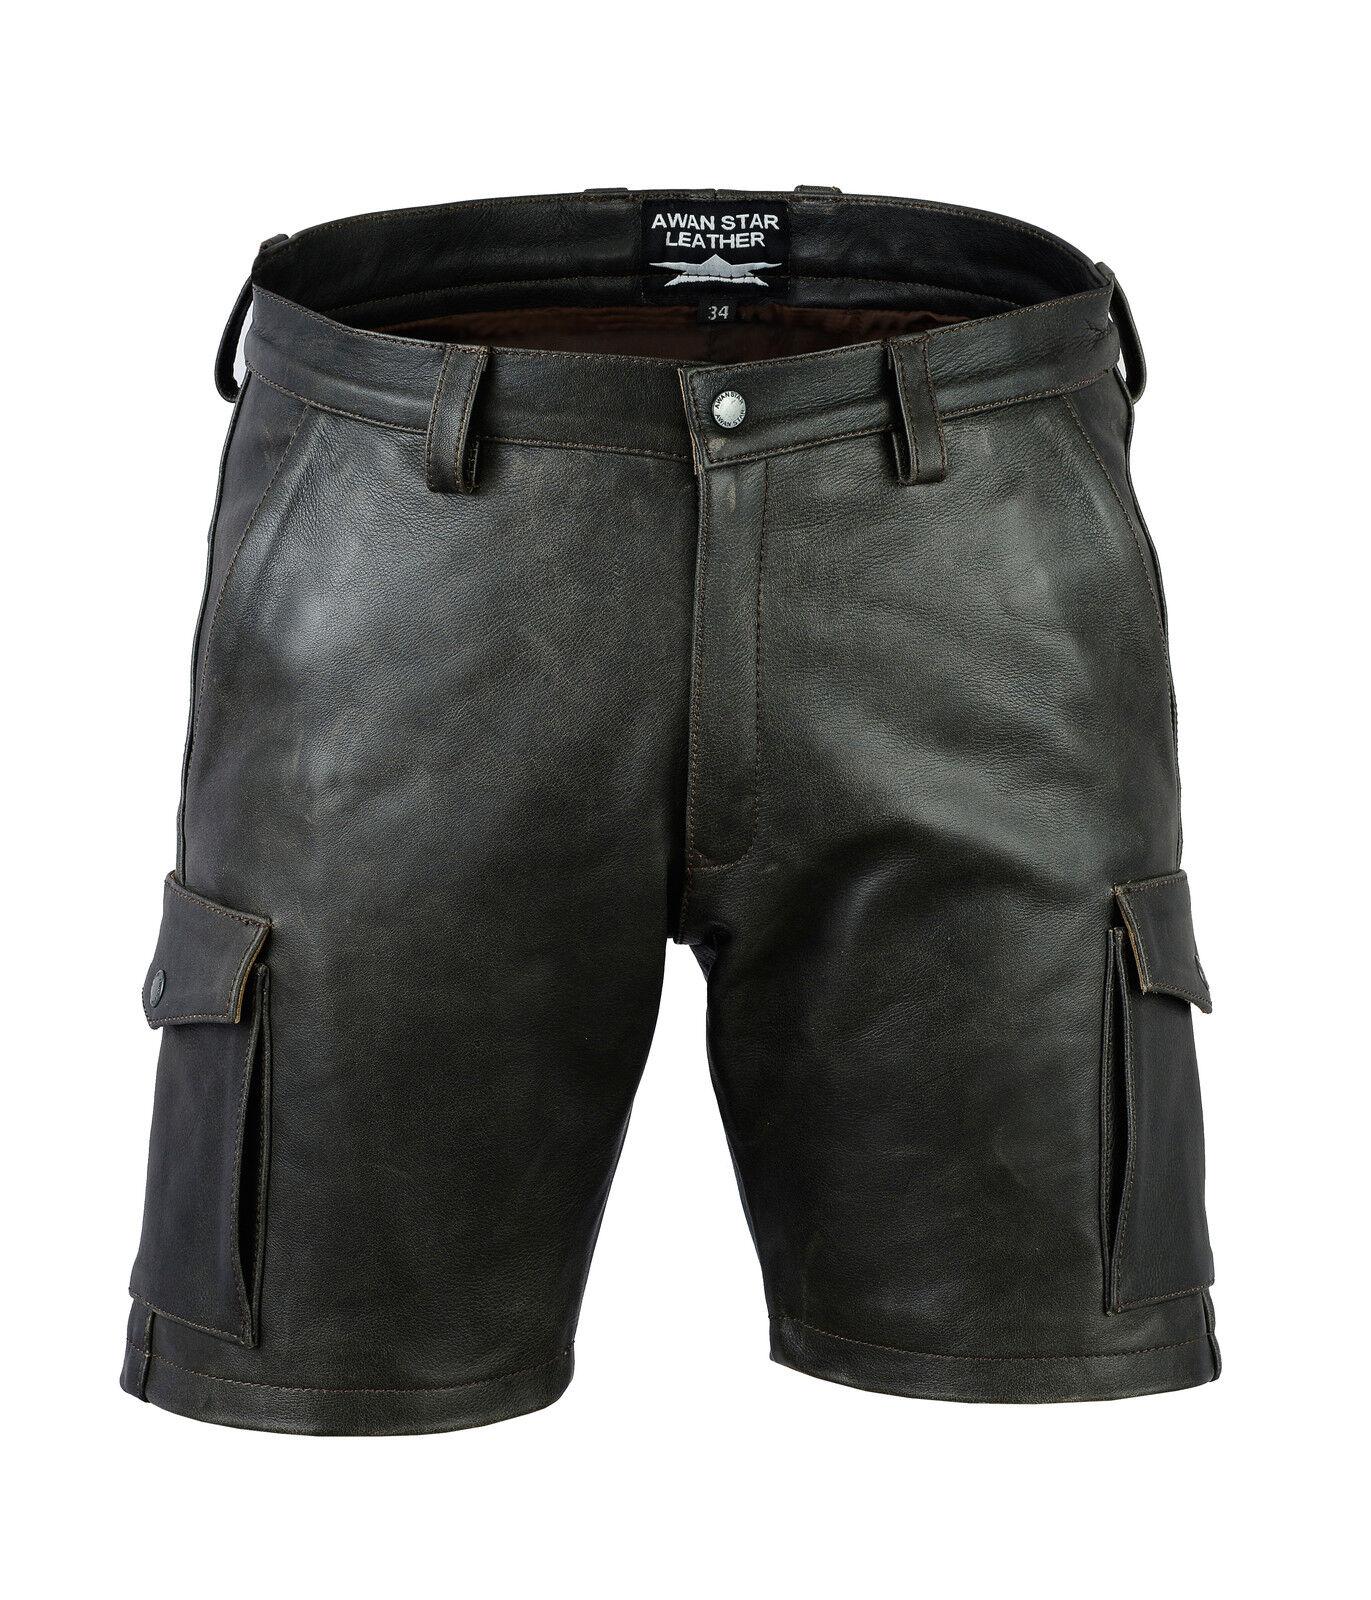 Awanstar Cargo leder shorts Ledershorts Farbe Antik,Leder Shorts,kurze lederhose | Trendy